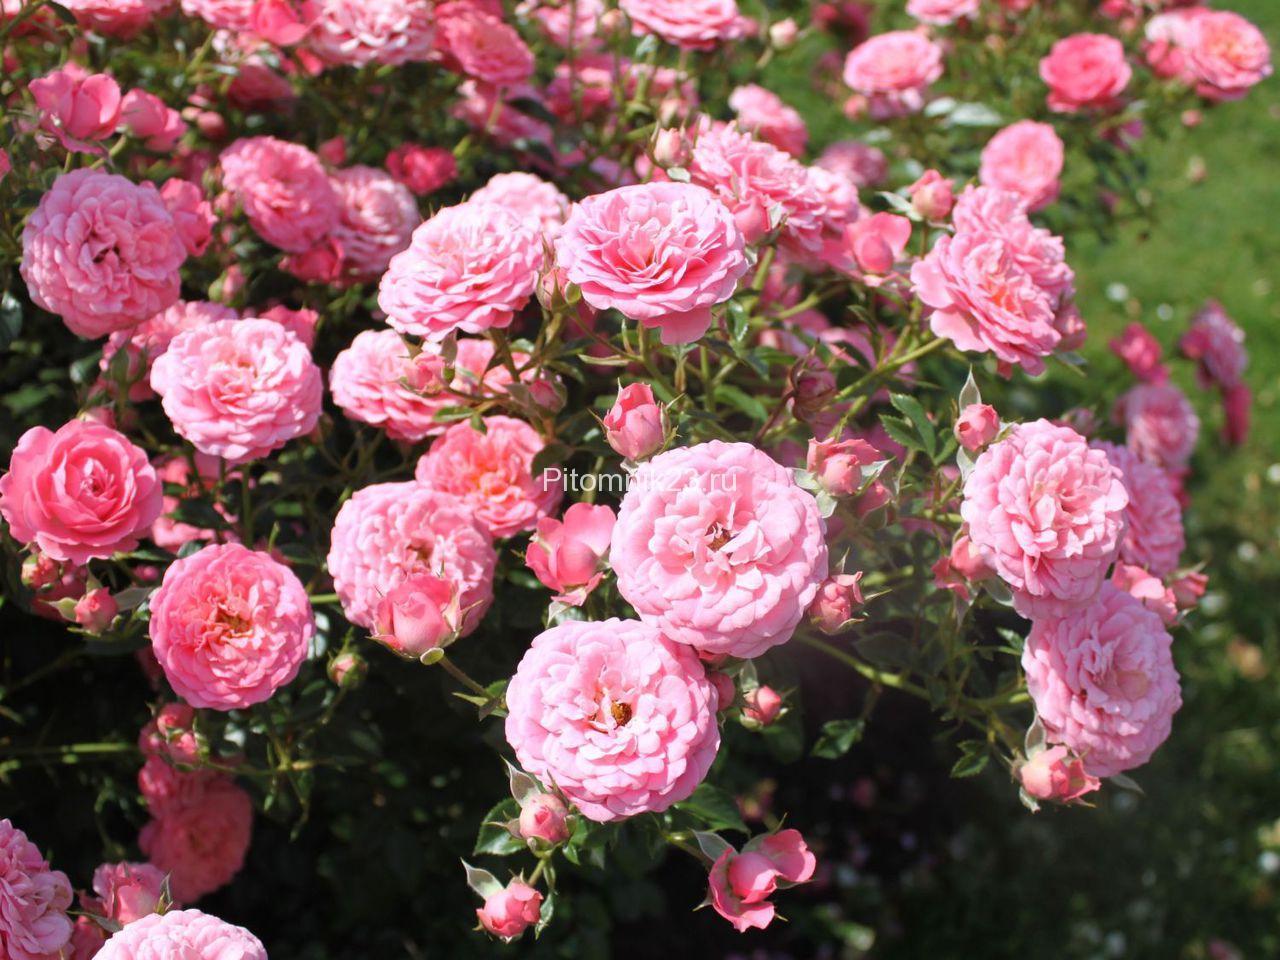 Саженцы миниатюрной розы Amulett (Амулет)